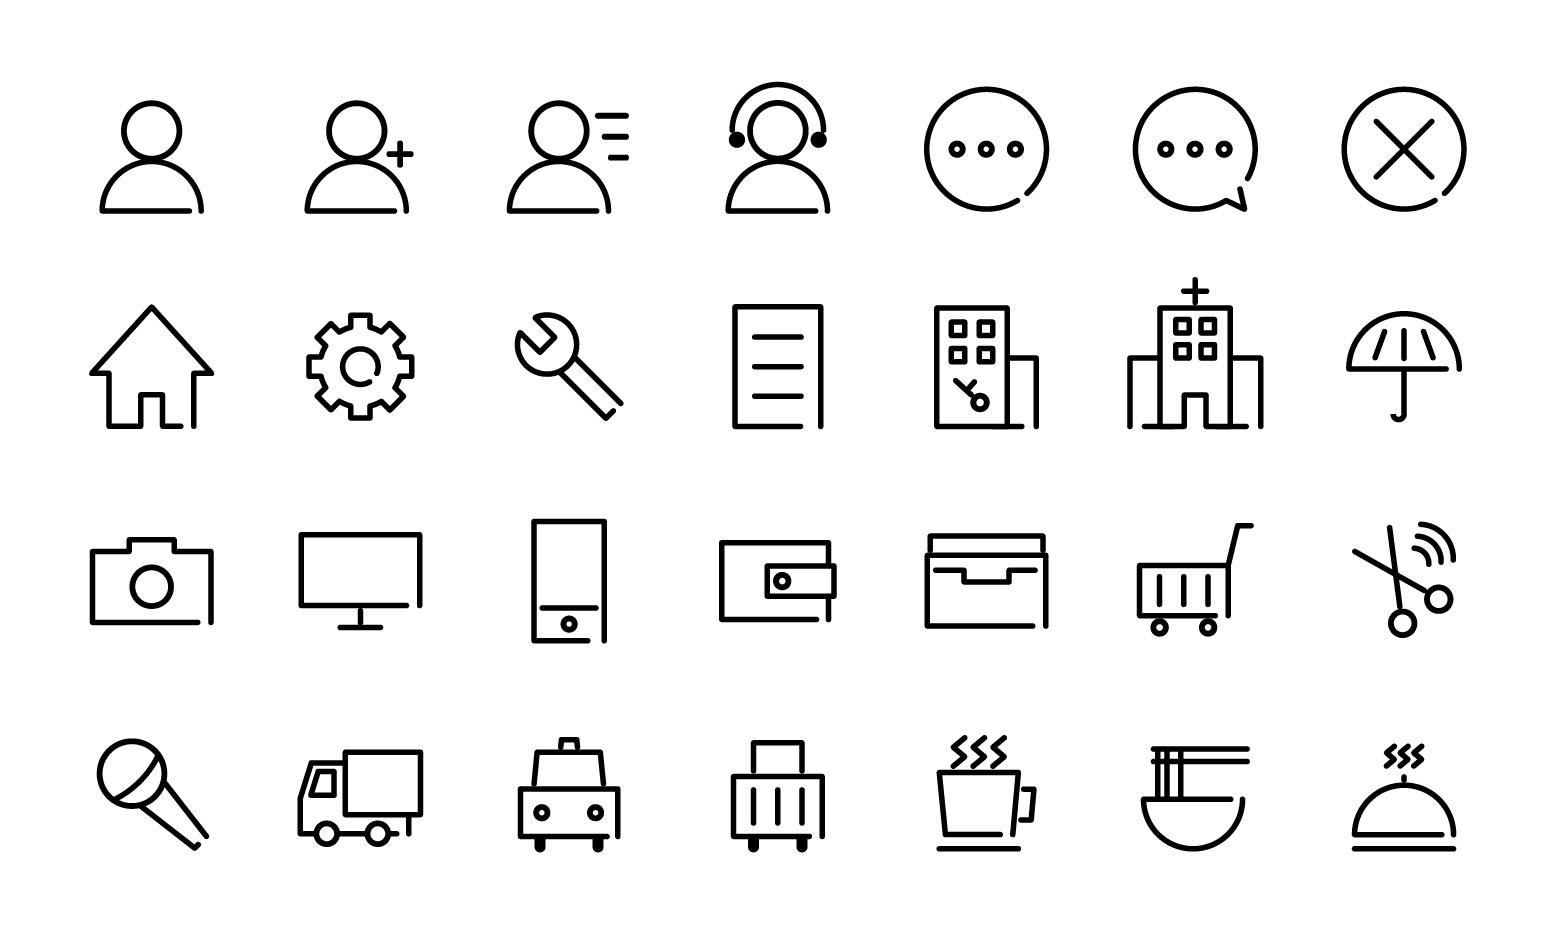 icon设计|ui|图标|mc_3k - 原创作品 - 站酷 (zcool)图片